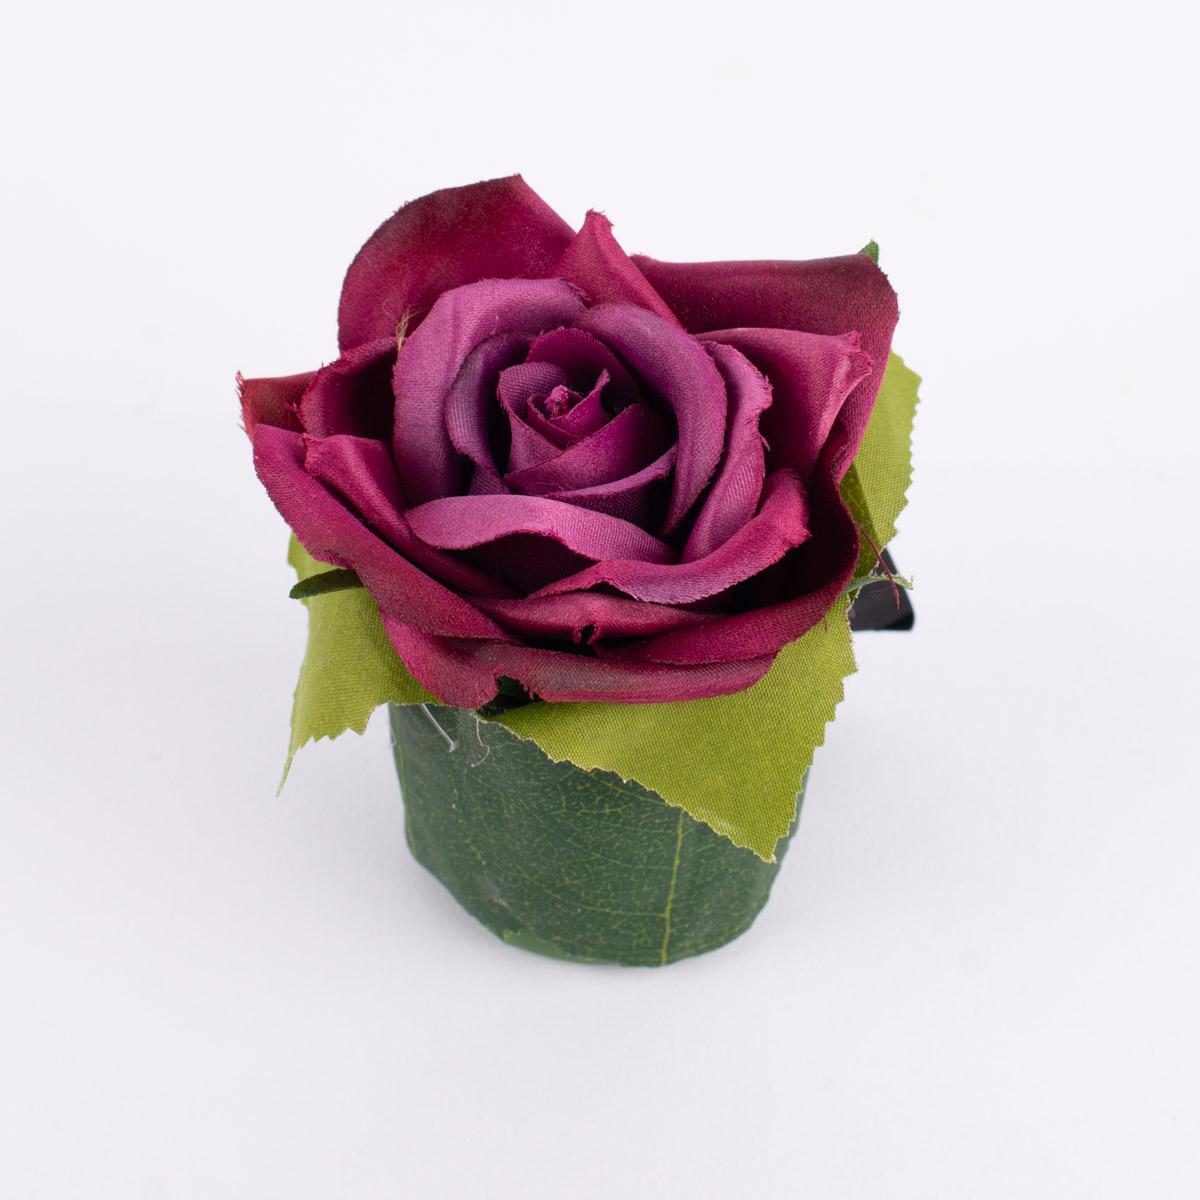 Kunstblume Rose mit Blätter im Topf lila beere 7,5x4,5cm